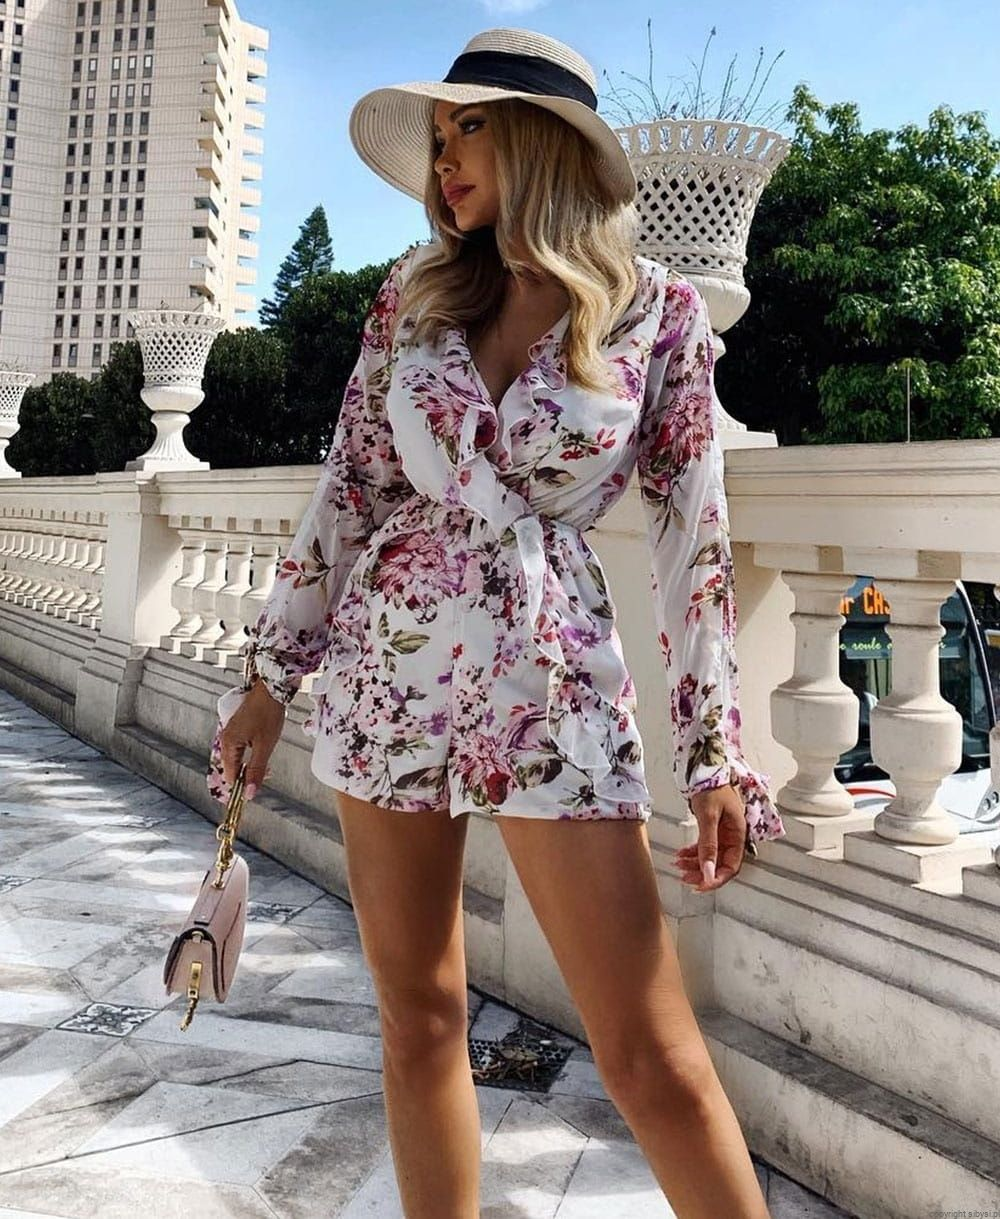 Krotki Kombinezon W Kwiaty Paris Floral Playsuit Playsuit Outfits